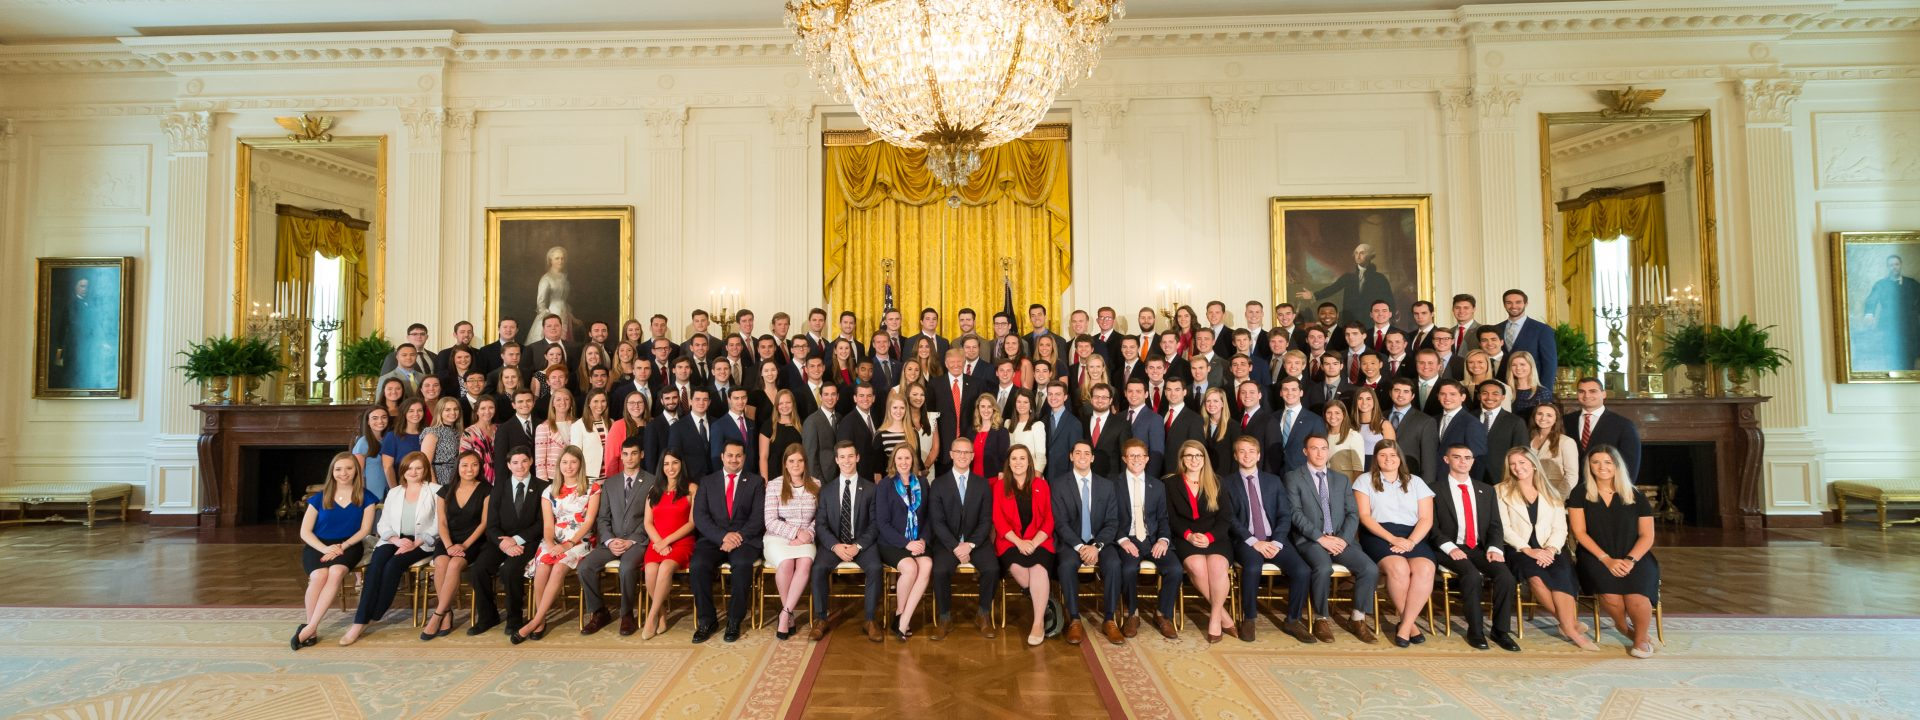 white house interns 2018.jpg